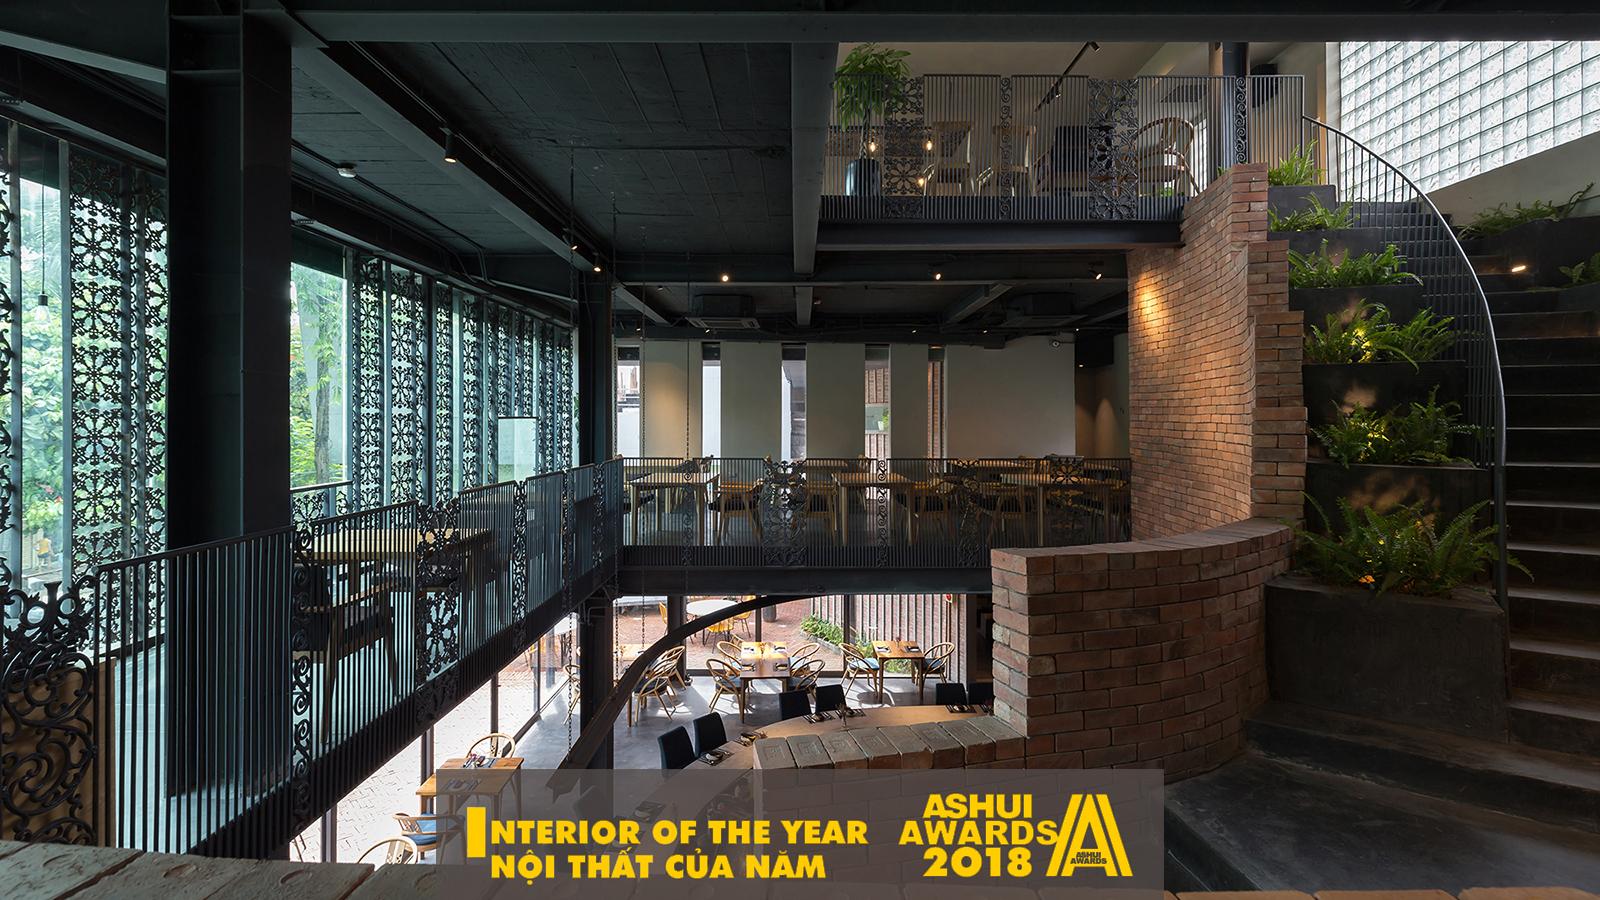 Ashui Awards 2018 1